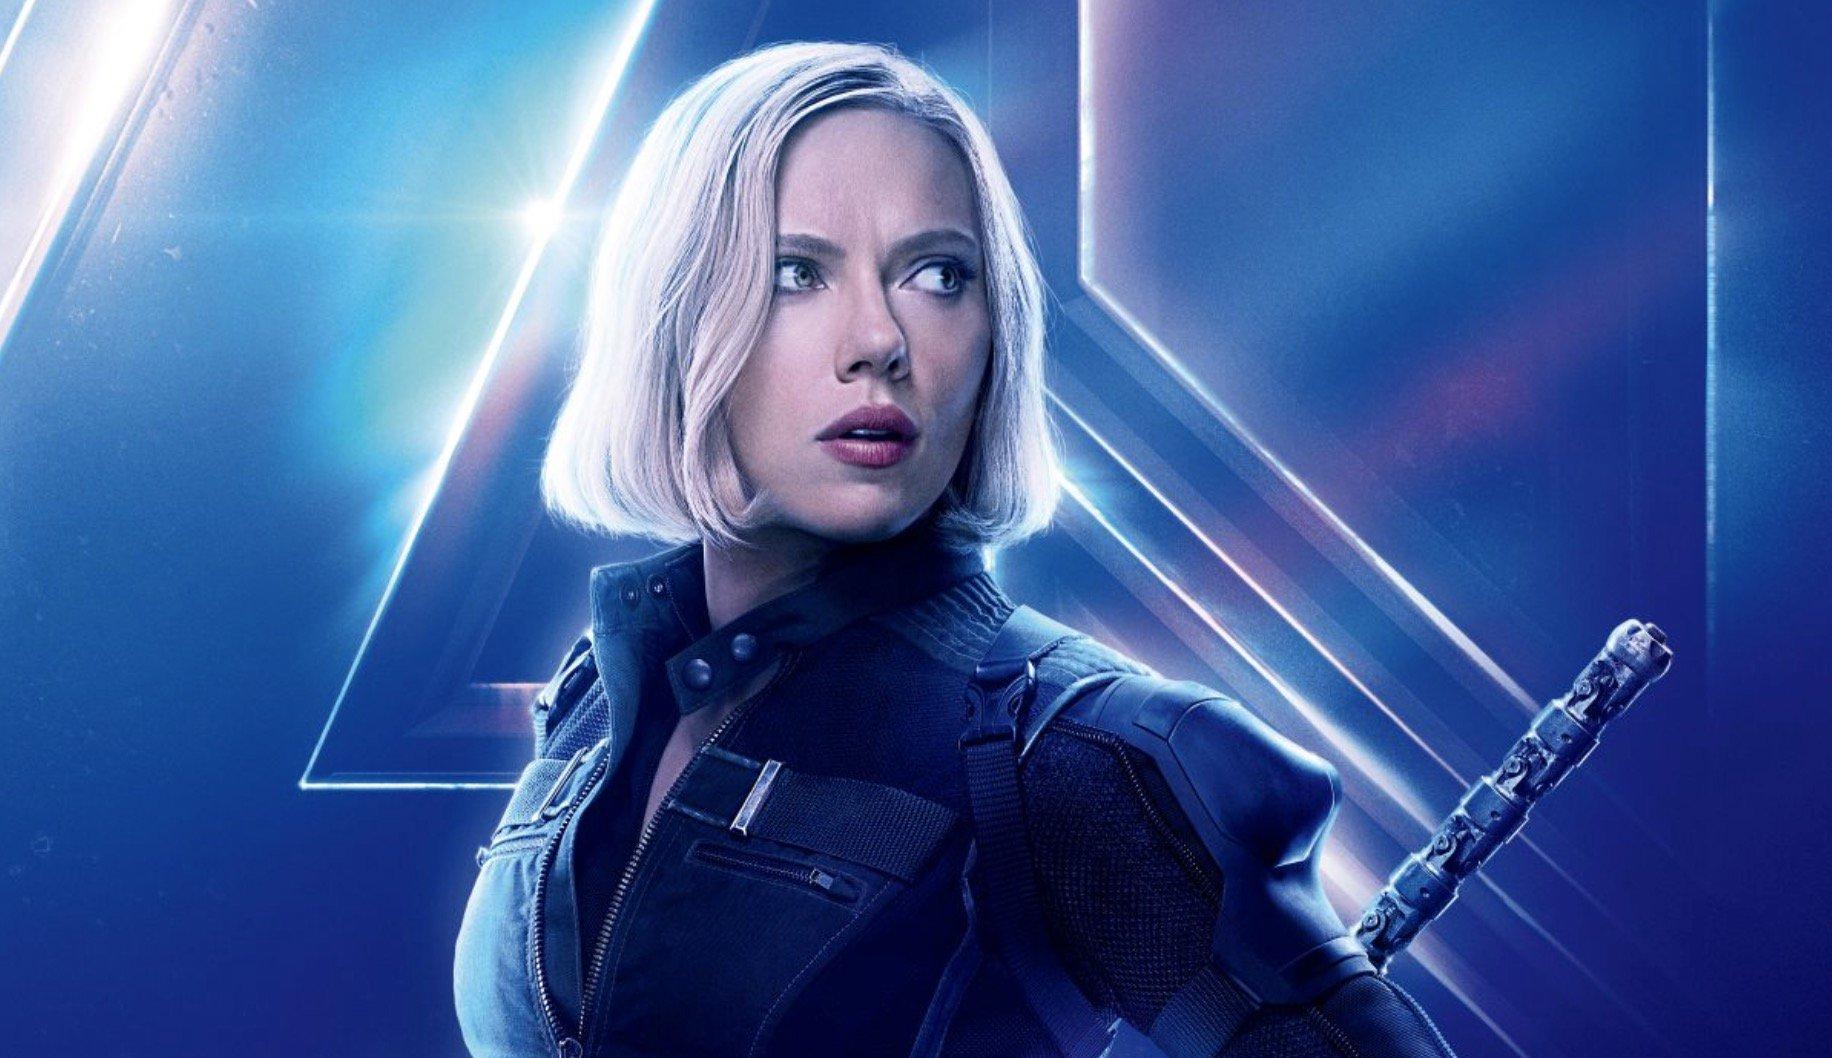 Marvel is closer than ever to hiring a Black Widow director https://t.co/HA6Do5q59c https://t.co/EqA4D4YrUV